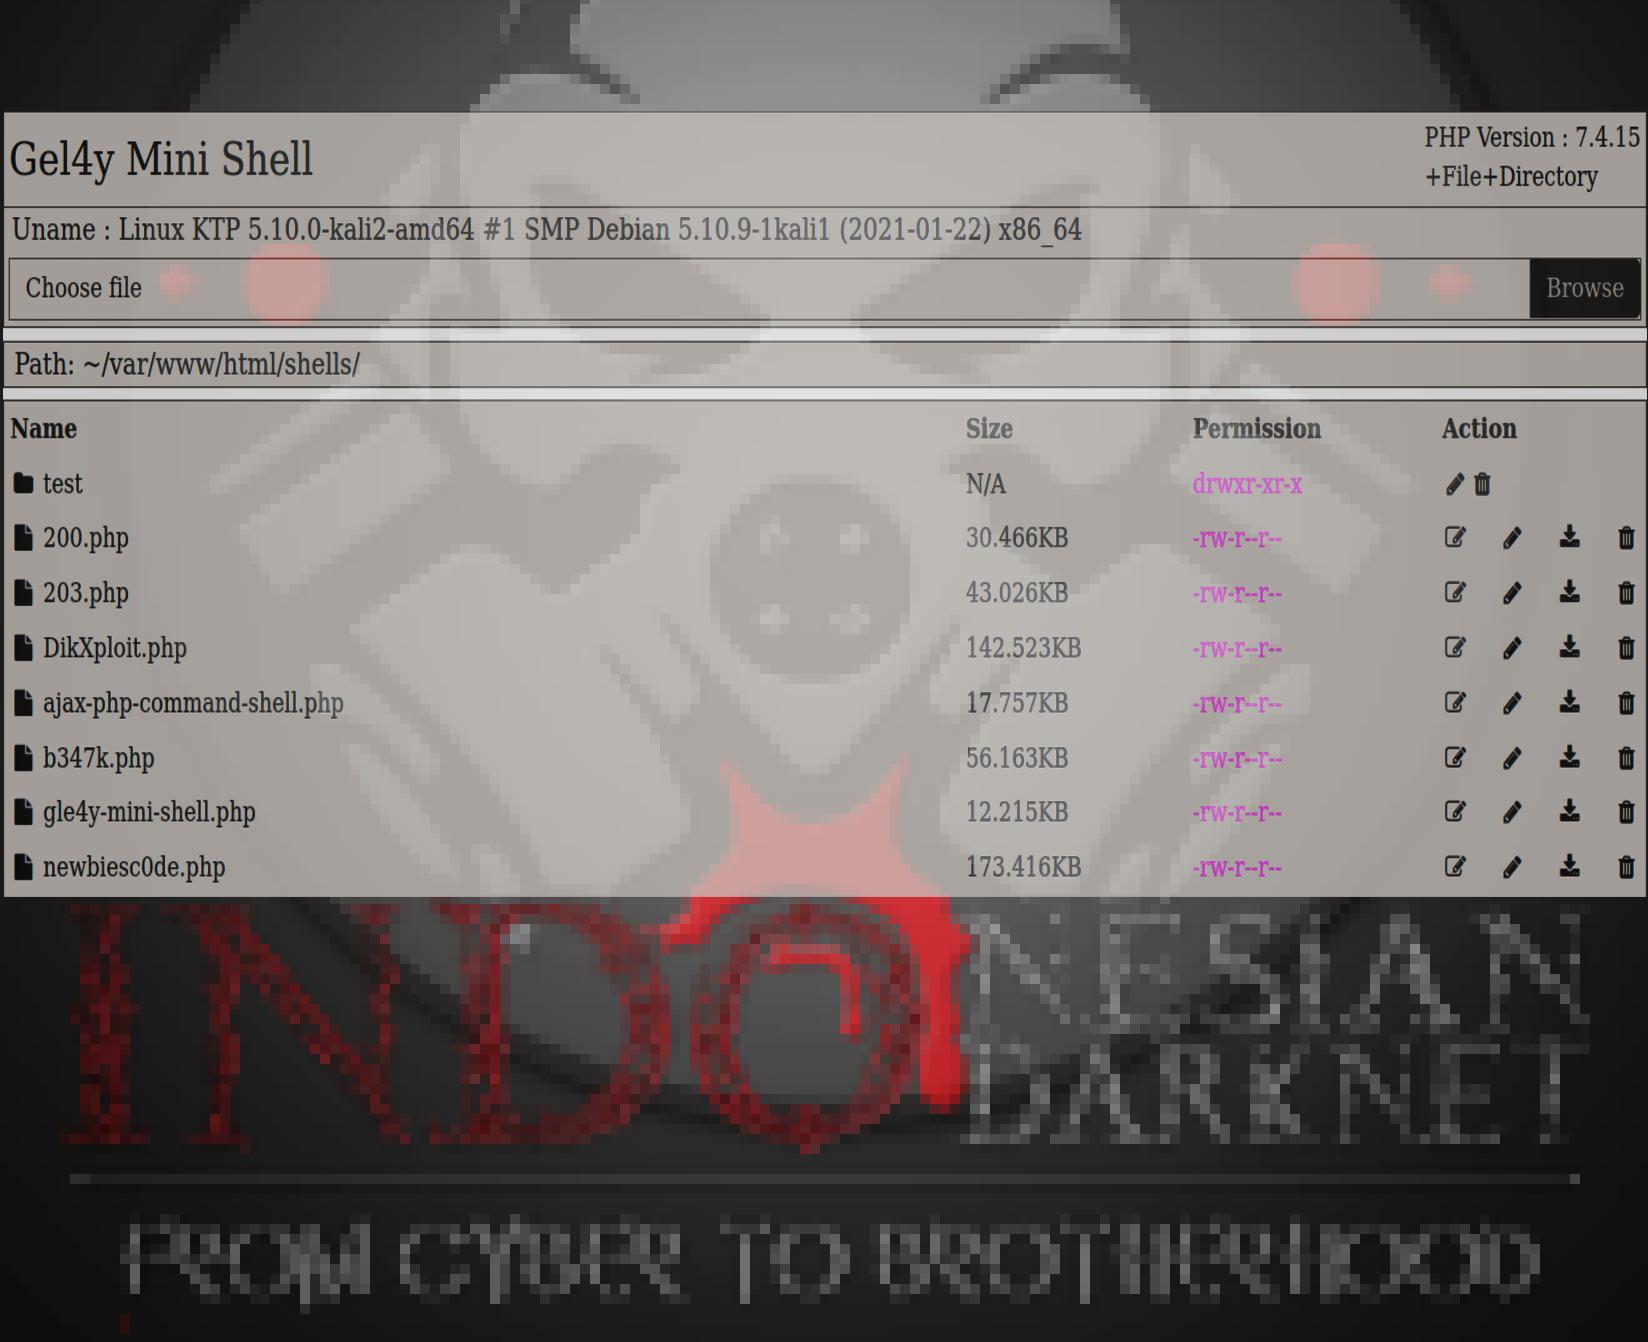 Gel4y Mini Shell by Indonesian Darknet